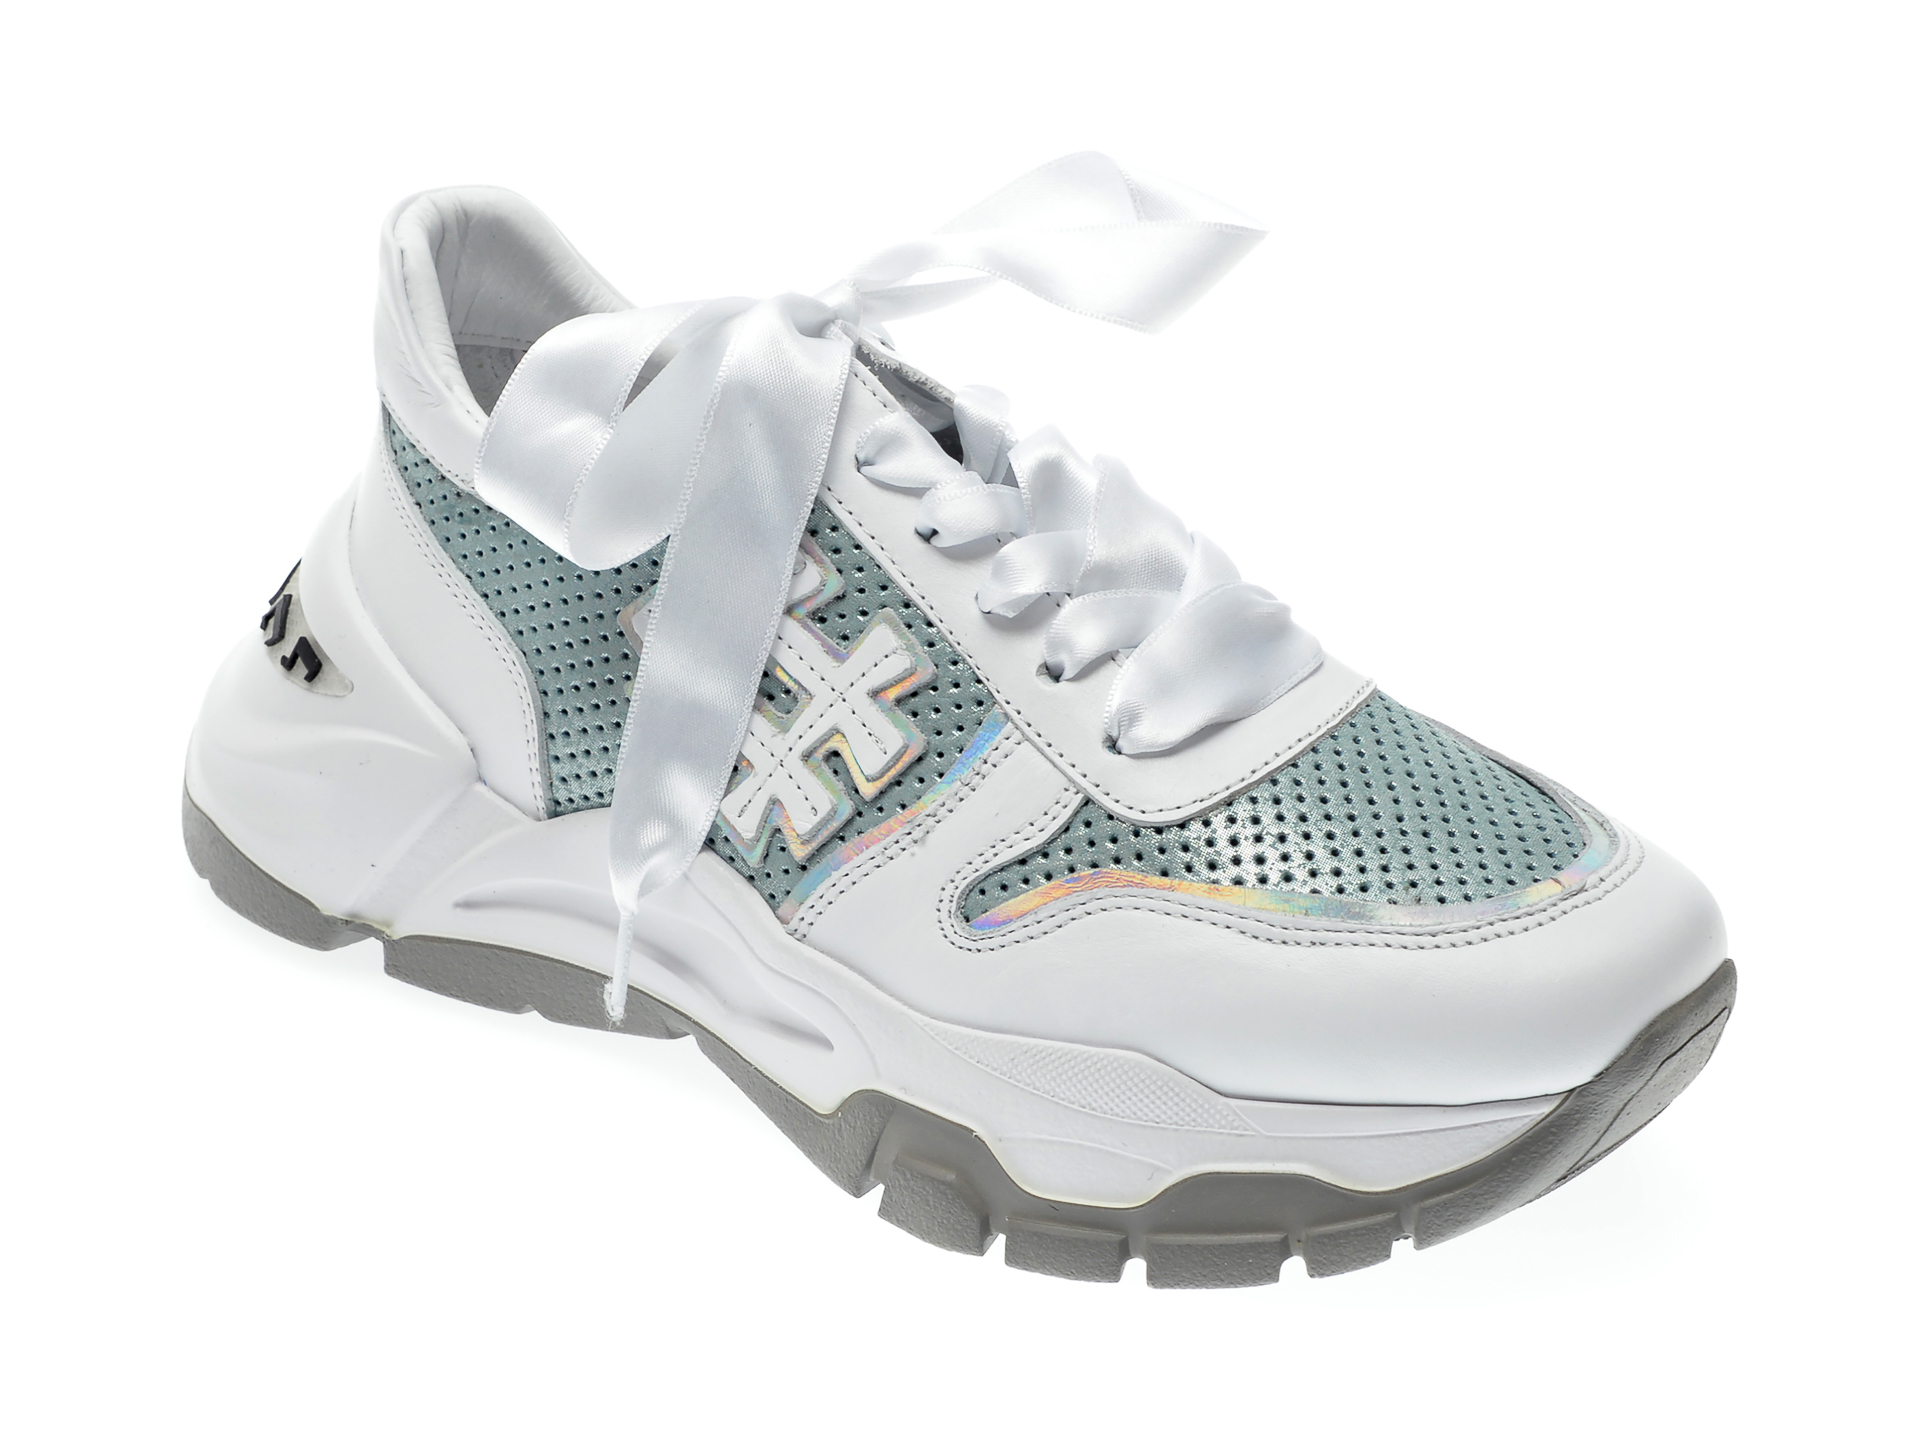 Pantofi sport EPICA albi, 135P230, din piele naturala